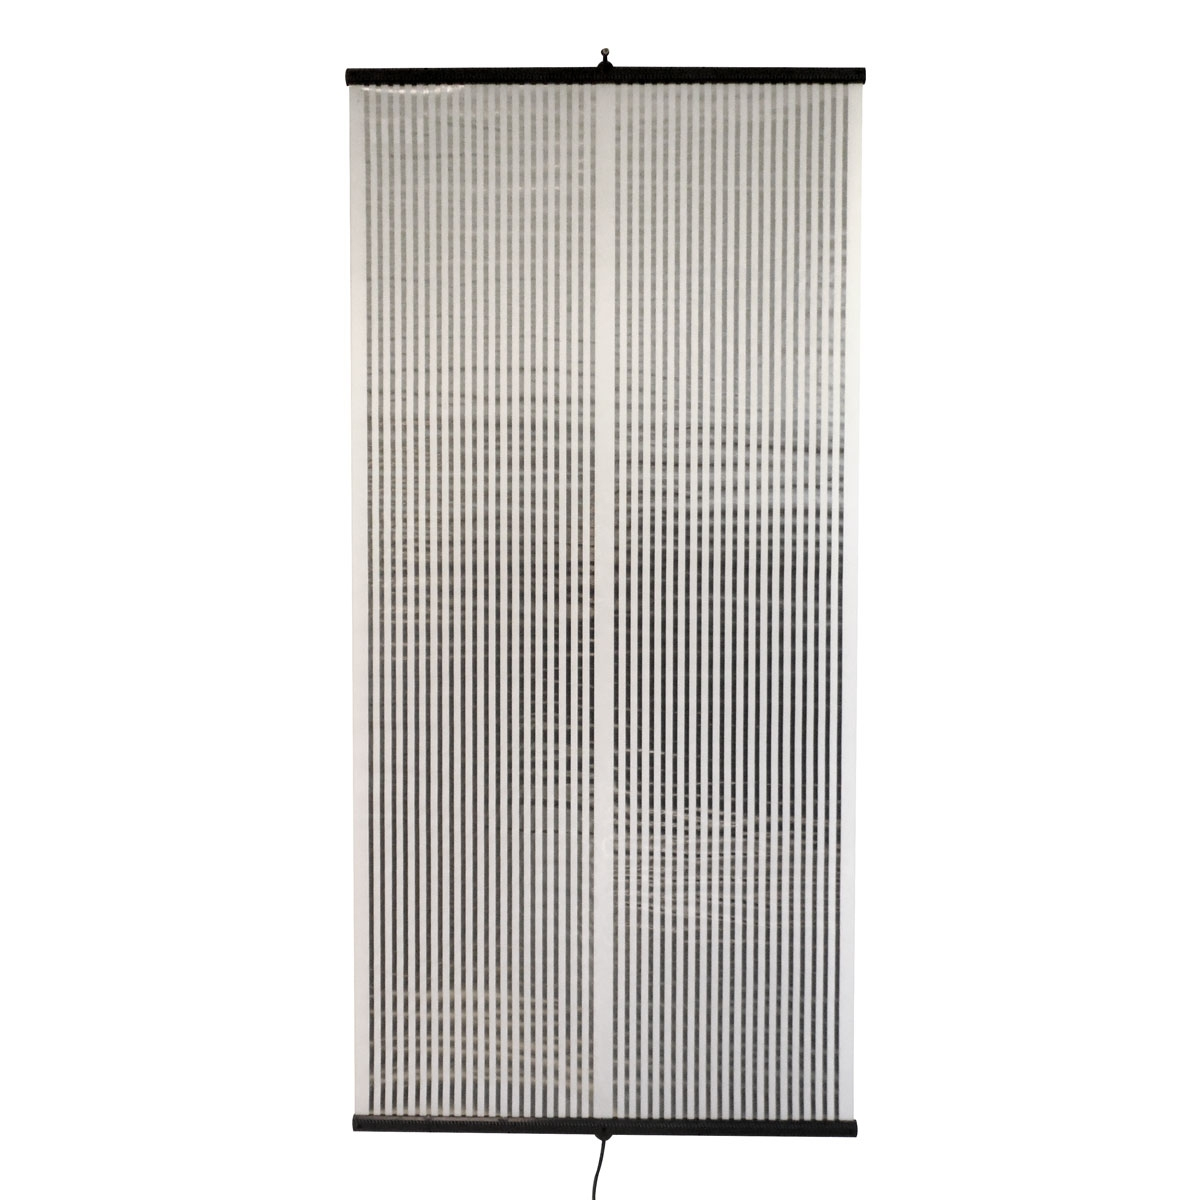 D cor chauffant 58 x 120cm ultra plat de 500w fixer sur for Chauffage radiant mural